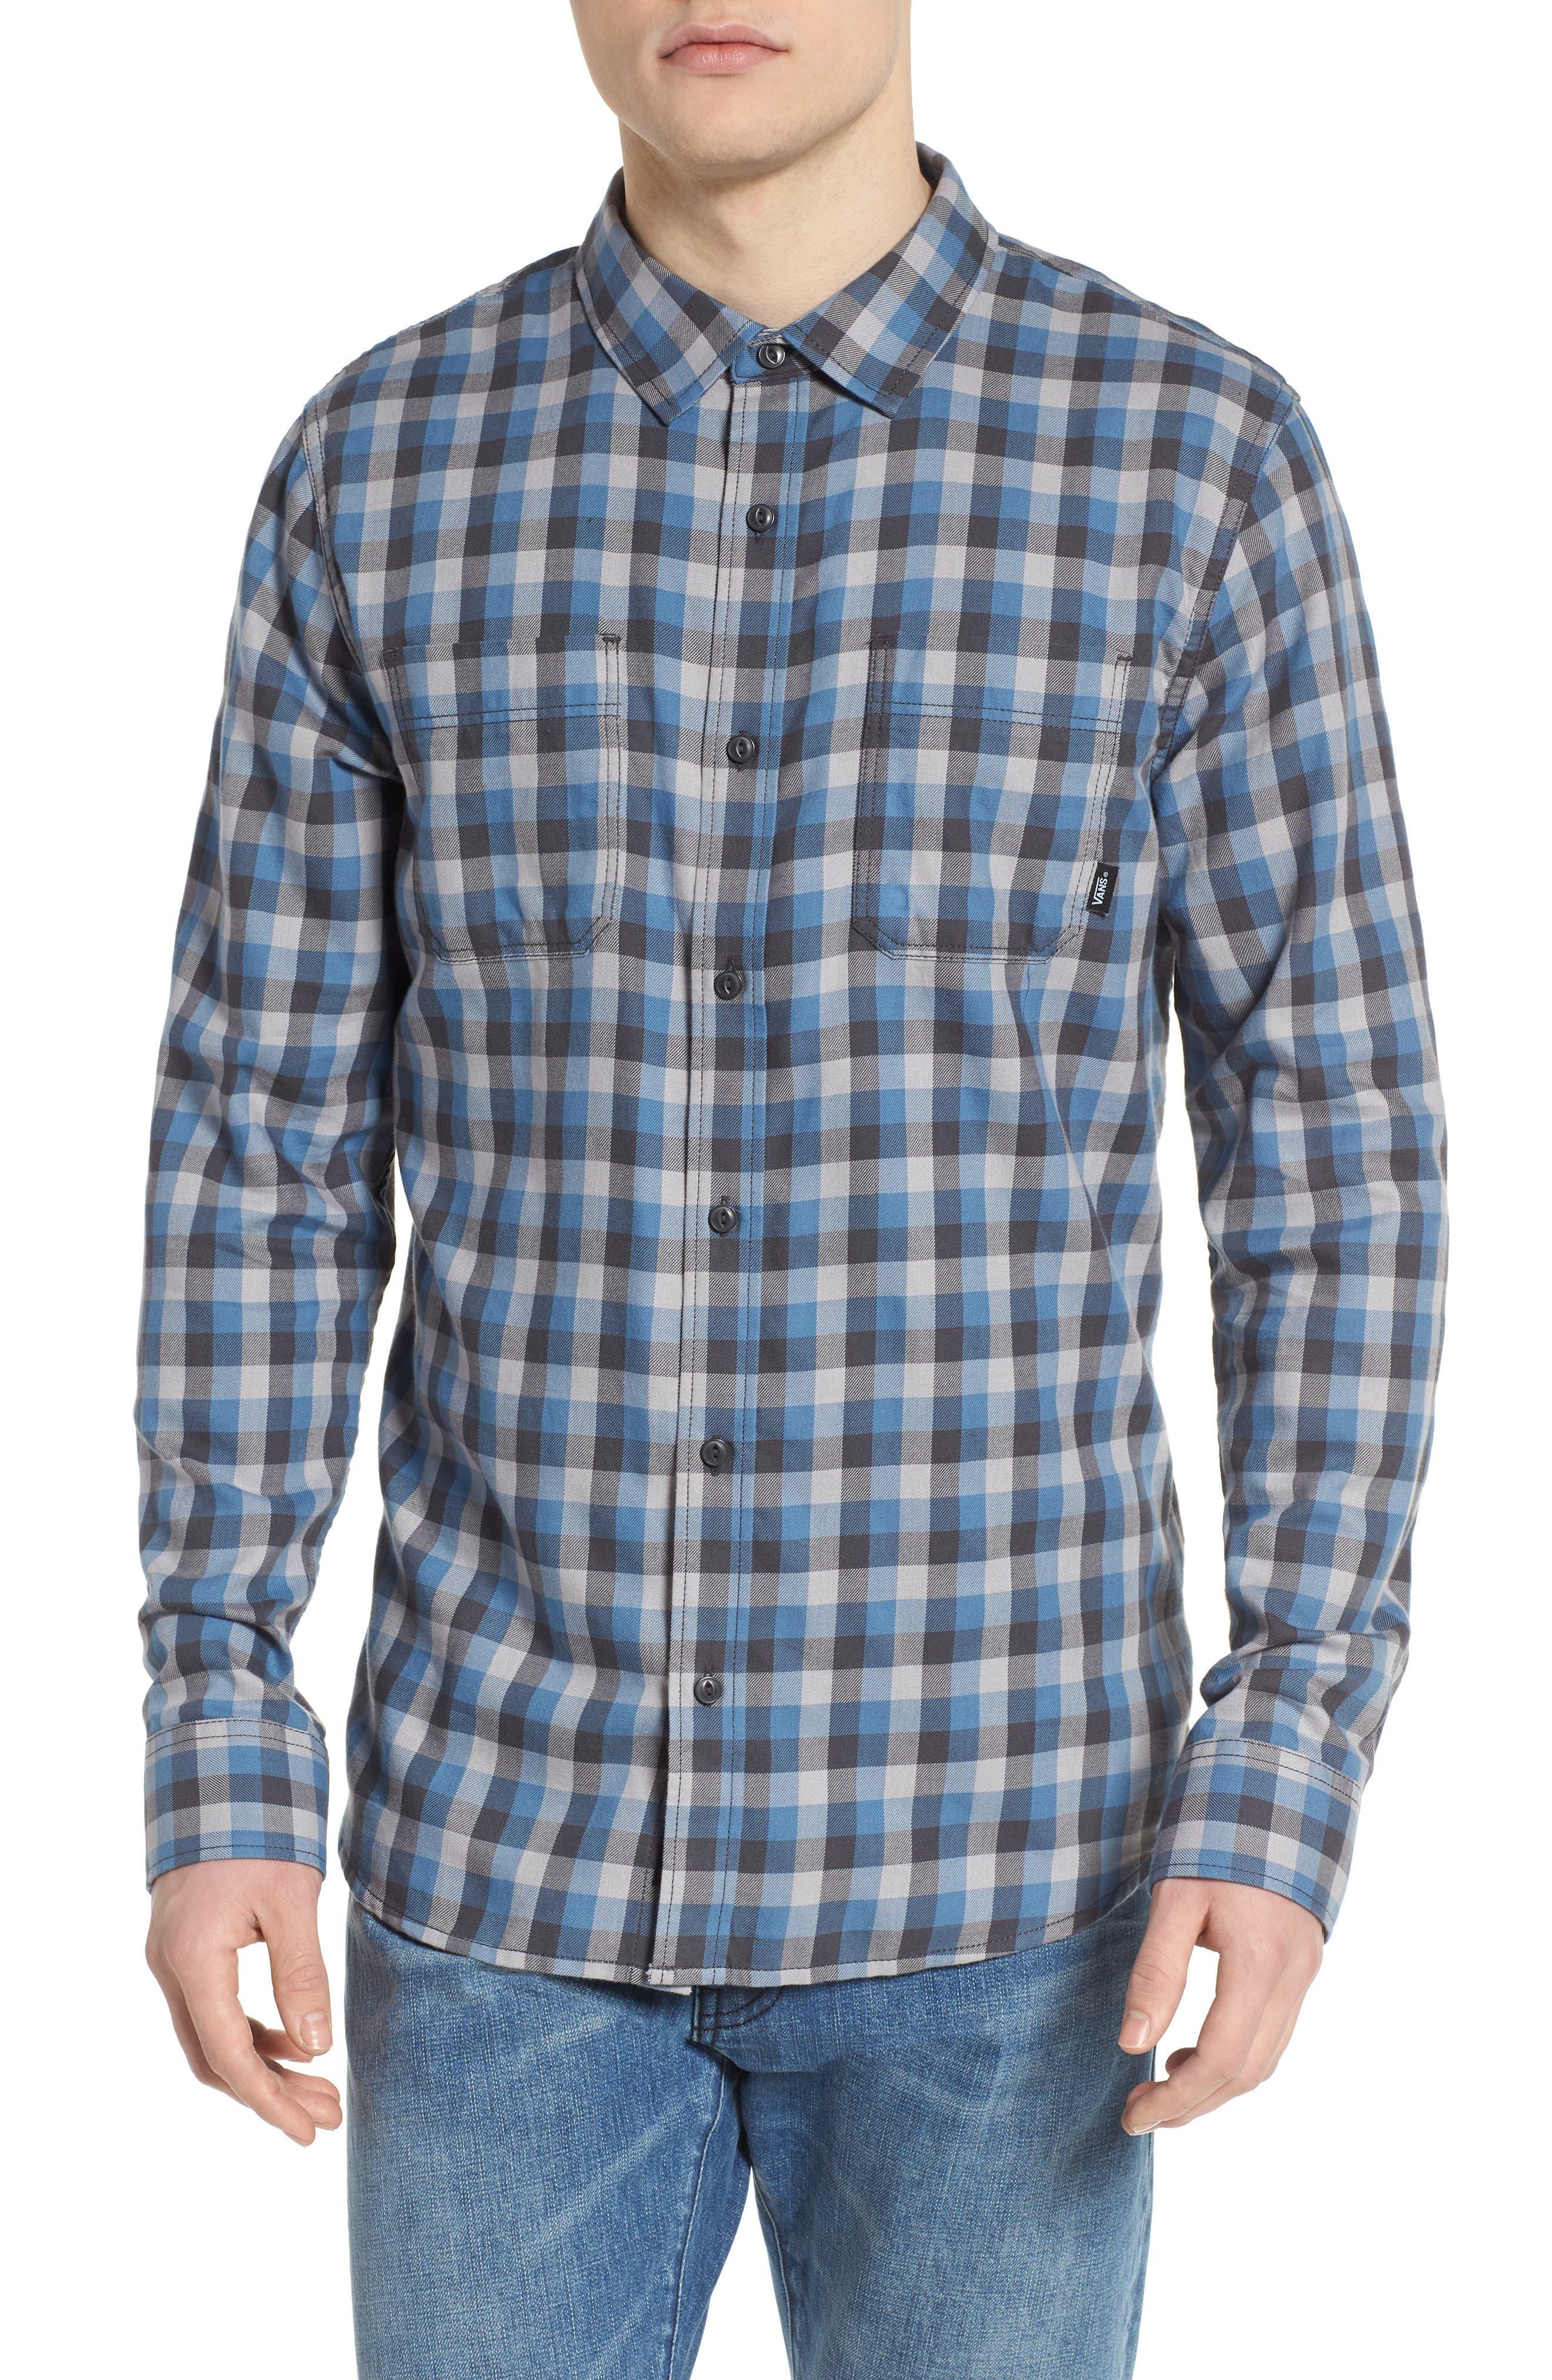 Alameda II Plaid Flannel Shirt,                             Main thumbnail 1, color,                             030